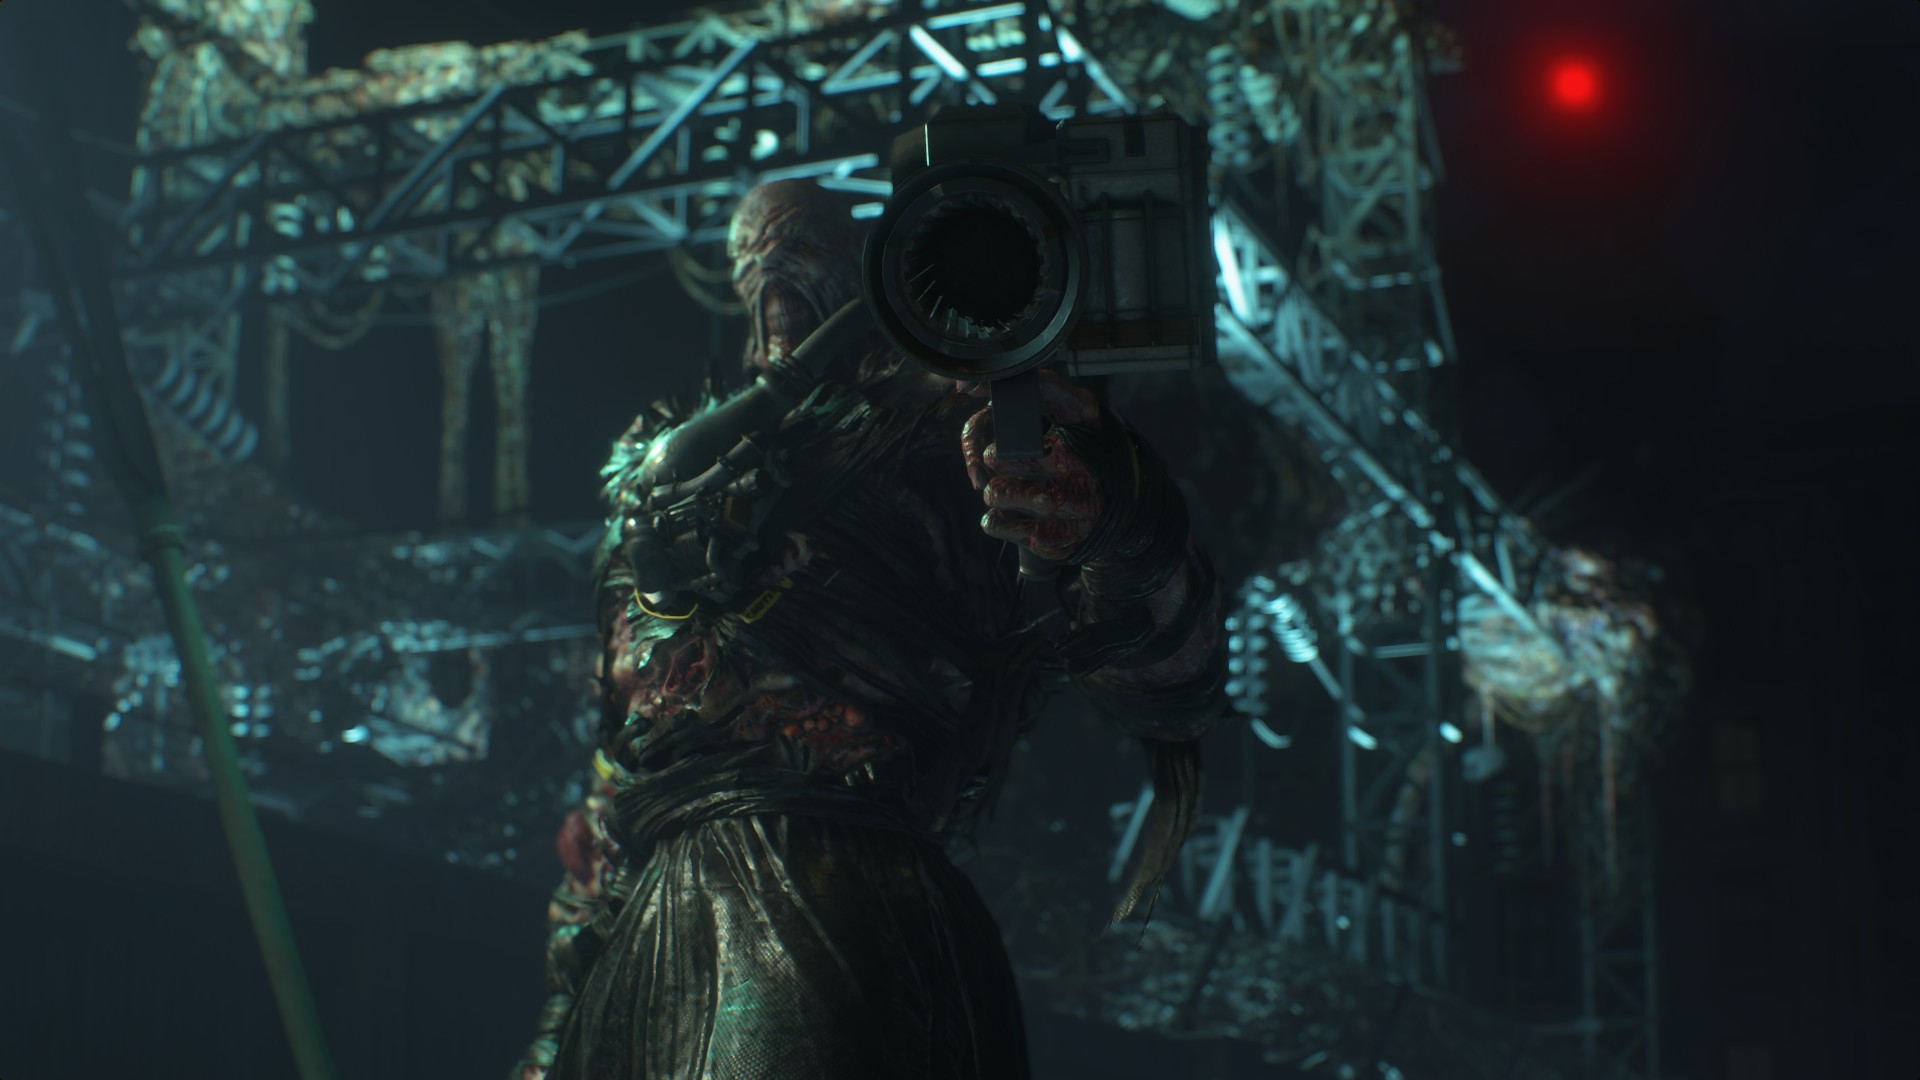 Resident Evil 3 Remake Cover Art Appears To Leak Online Ladbible